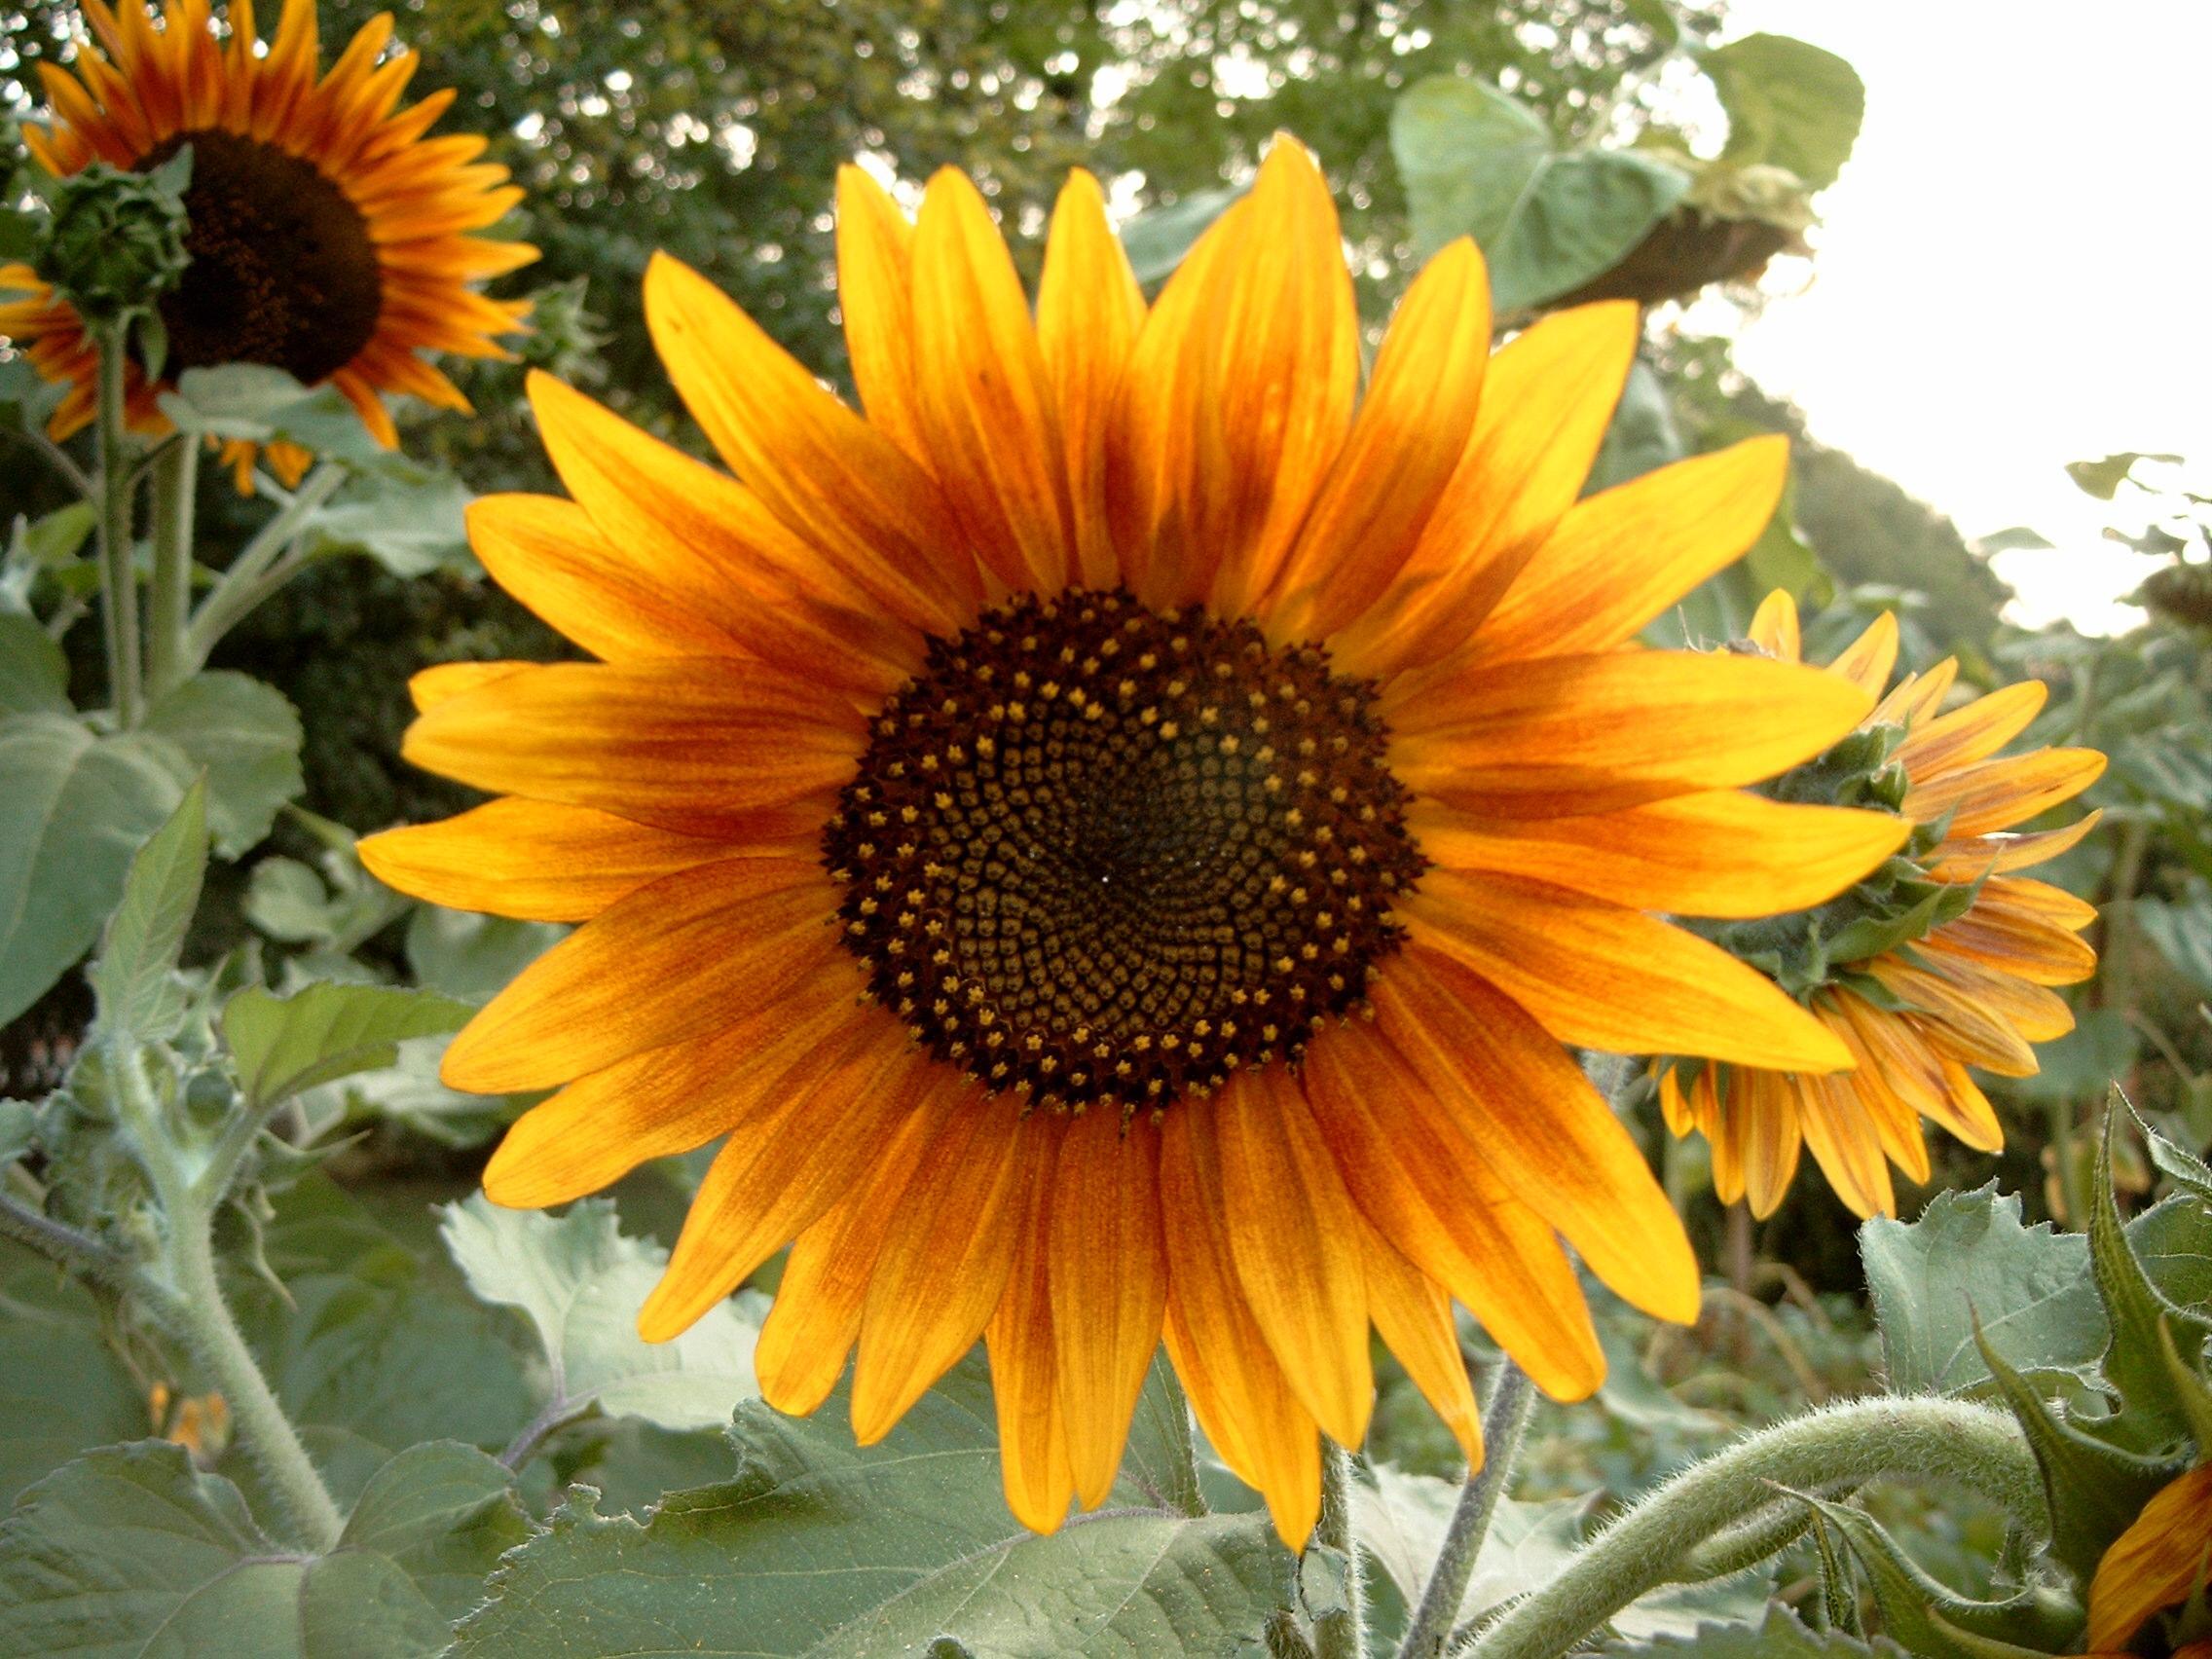 File:Sunflower Metalhead64.jpg - Wikimedia Commons